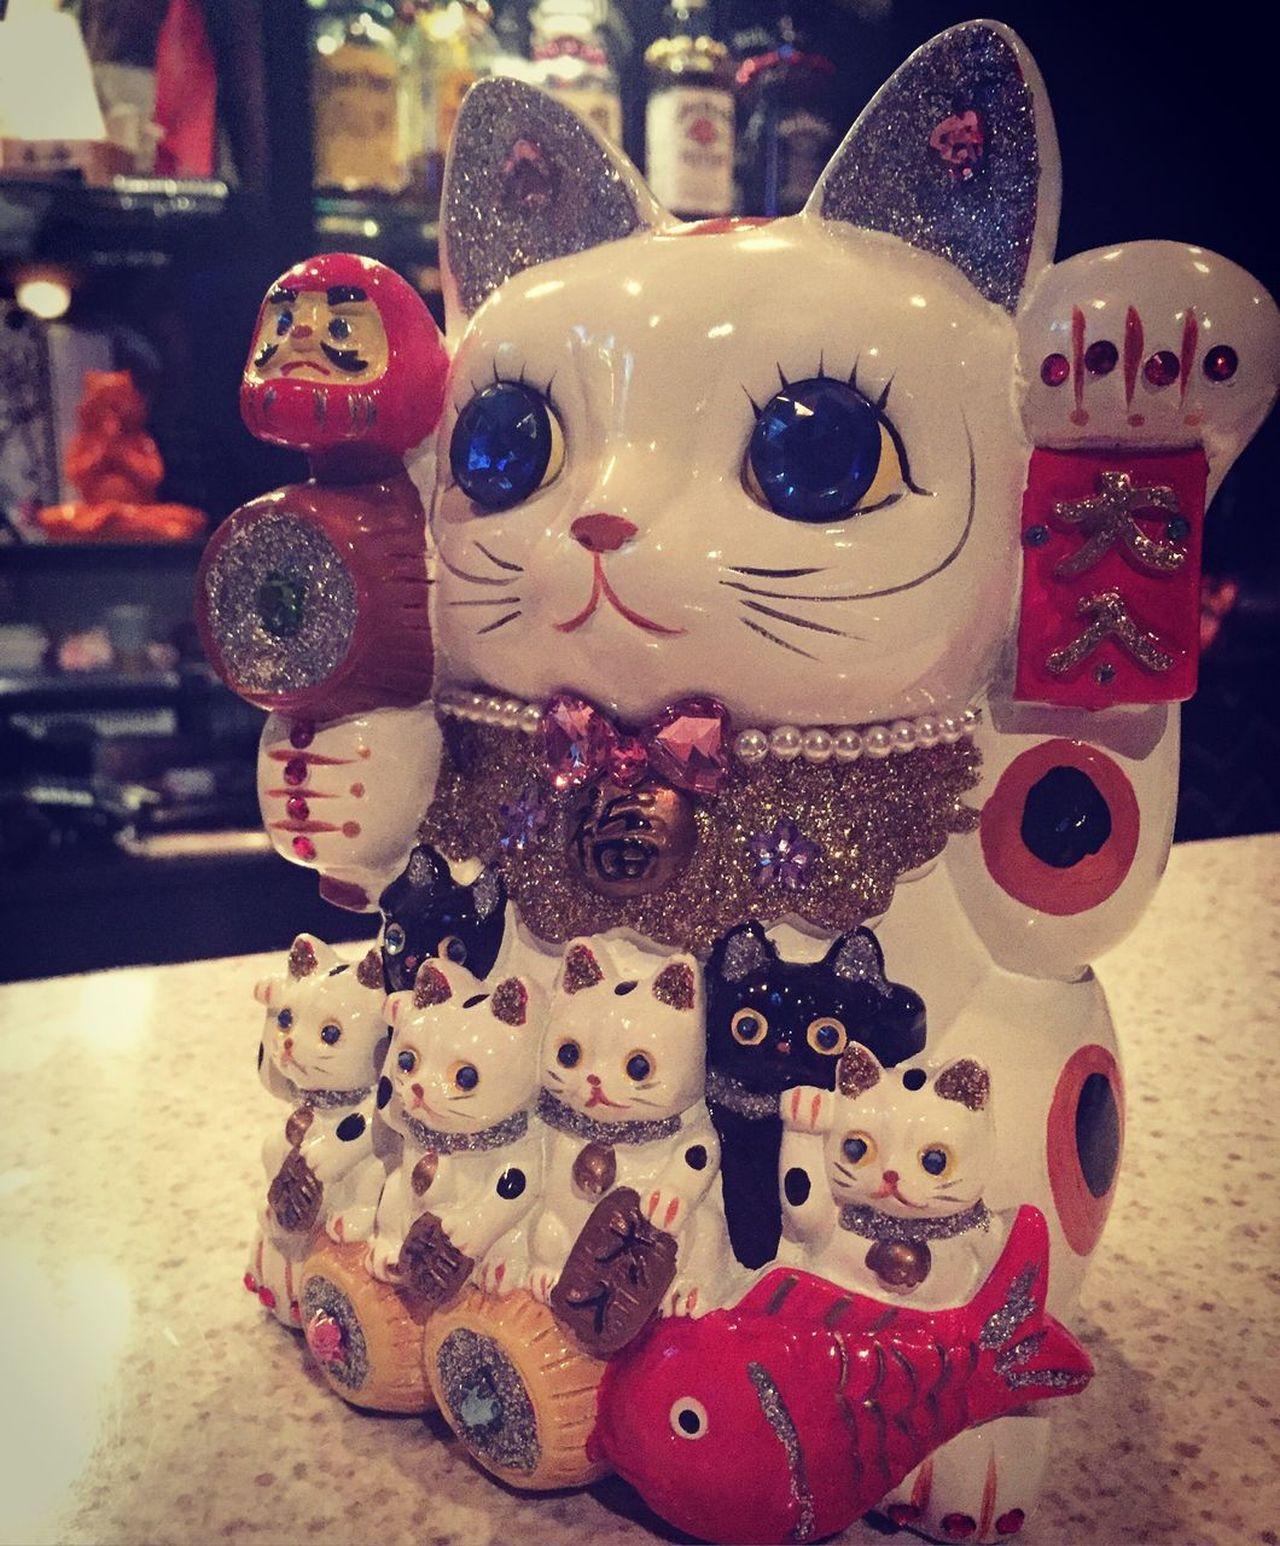 Cat Katze Glitter Decoration Manekineko 招き猫 Neko Meow KAWAII Japanese  Charm Glück Happy Luckycharm Lucky Kyoto Drunk Funnight Einsam Alleine Alone Jewelry Japan Welcome Willkommen